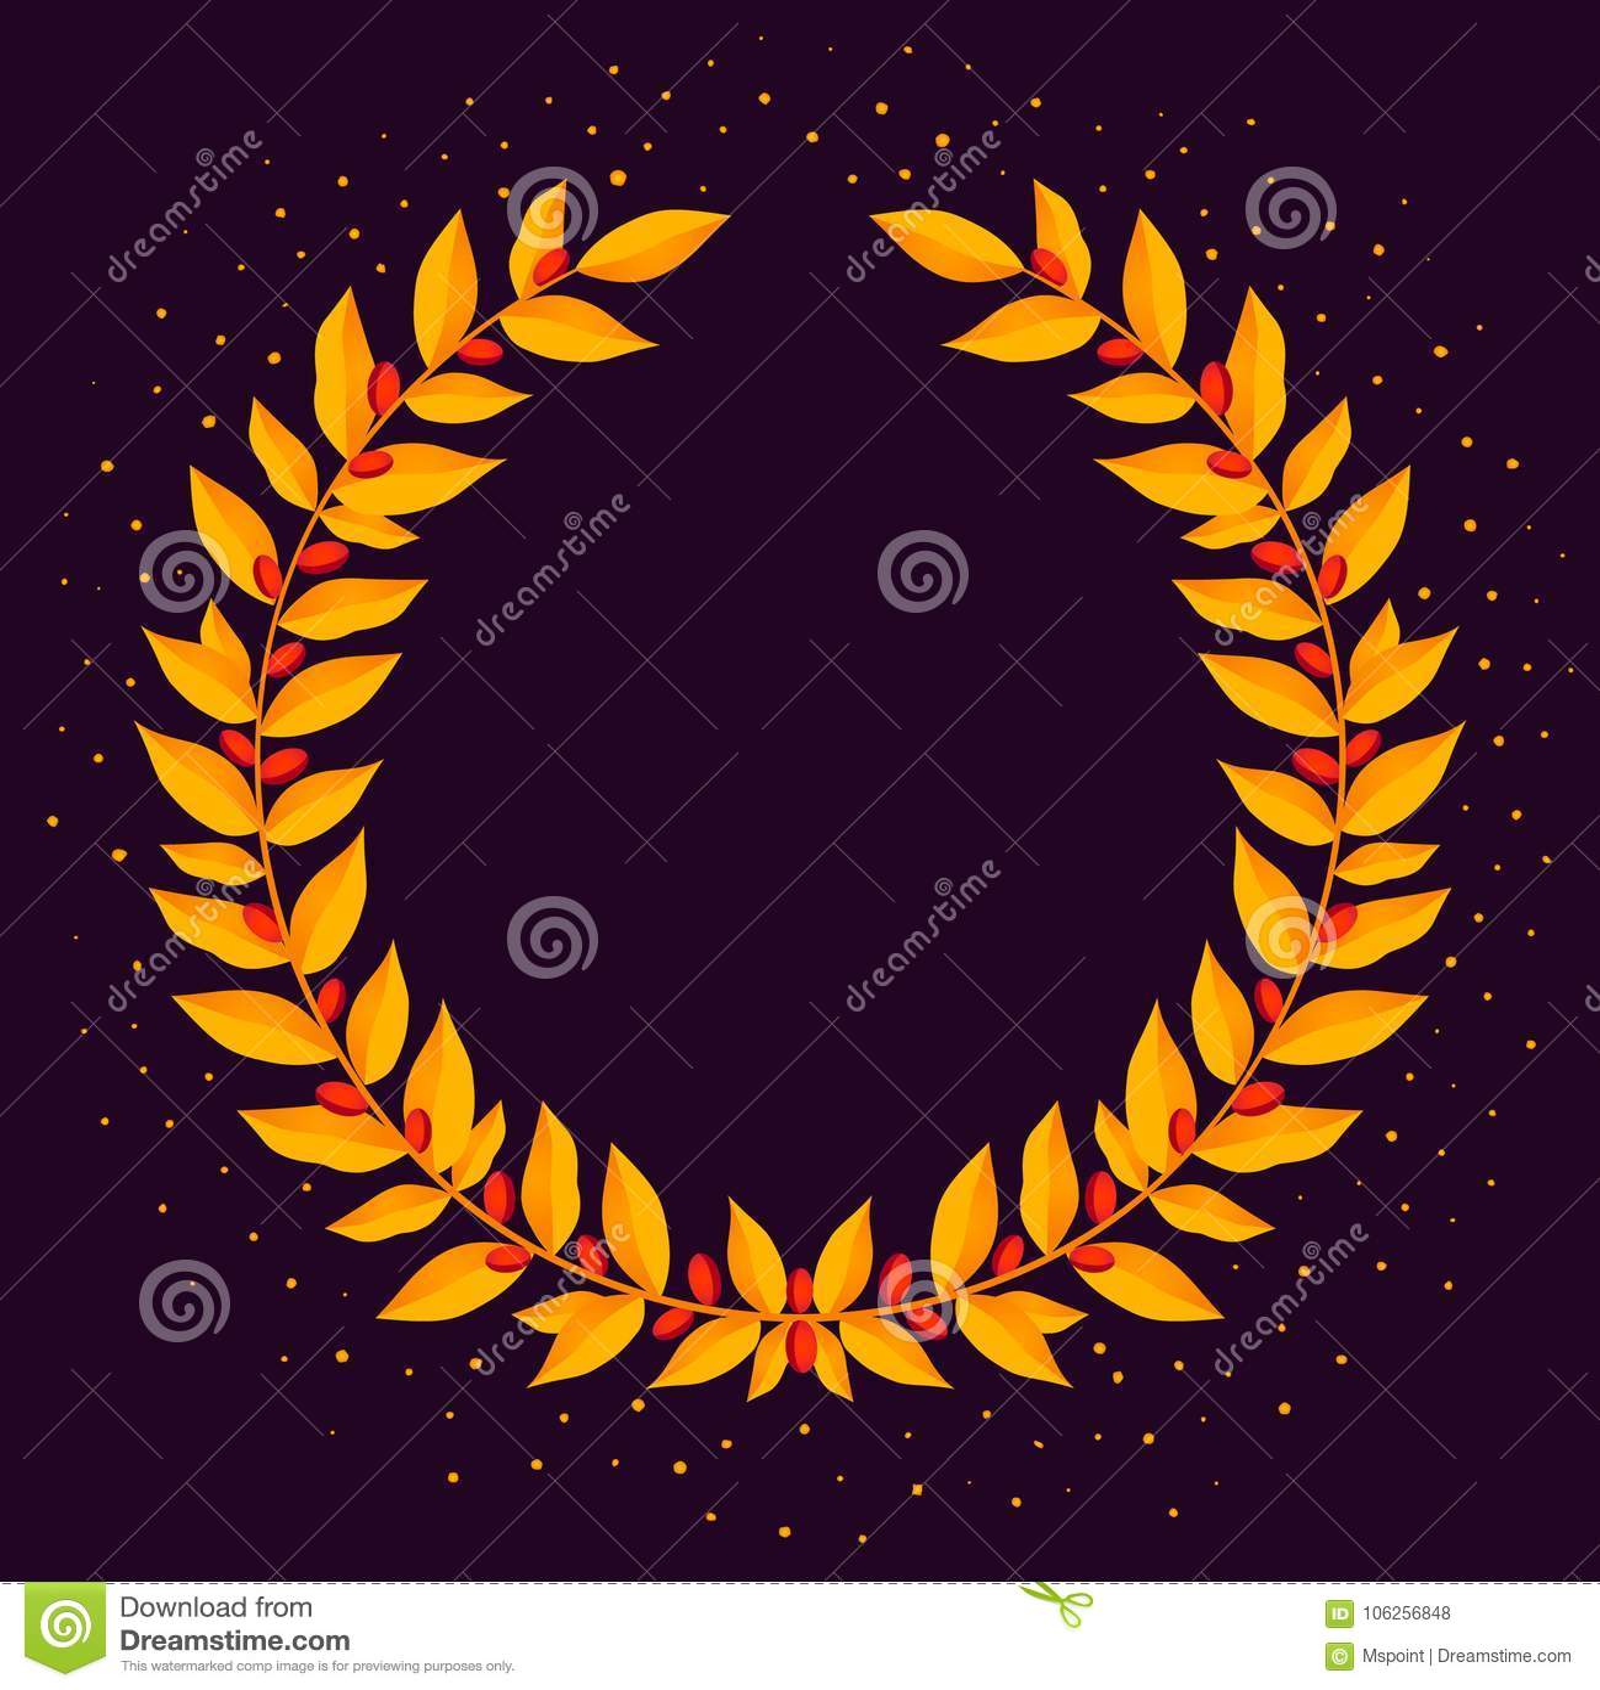 Gold Laurel Wreath Vintage Wreaths Heraldic Design Elements With